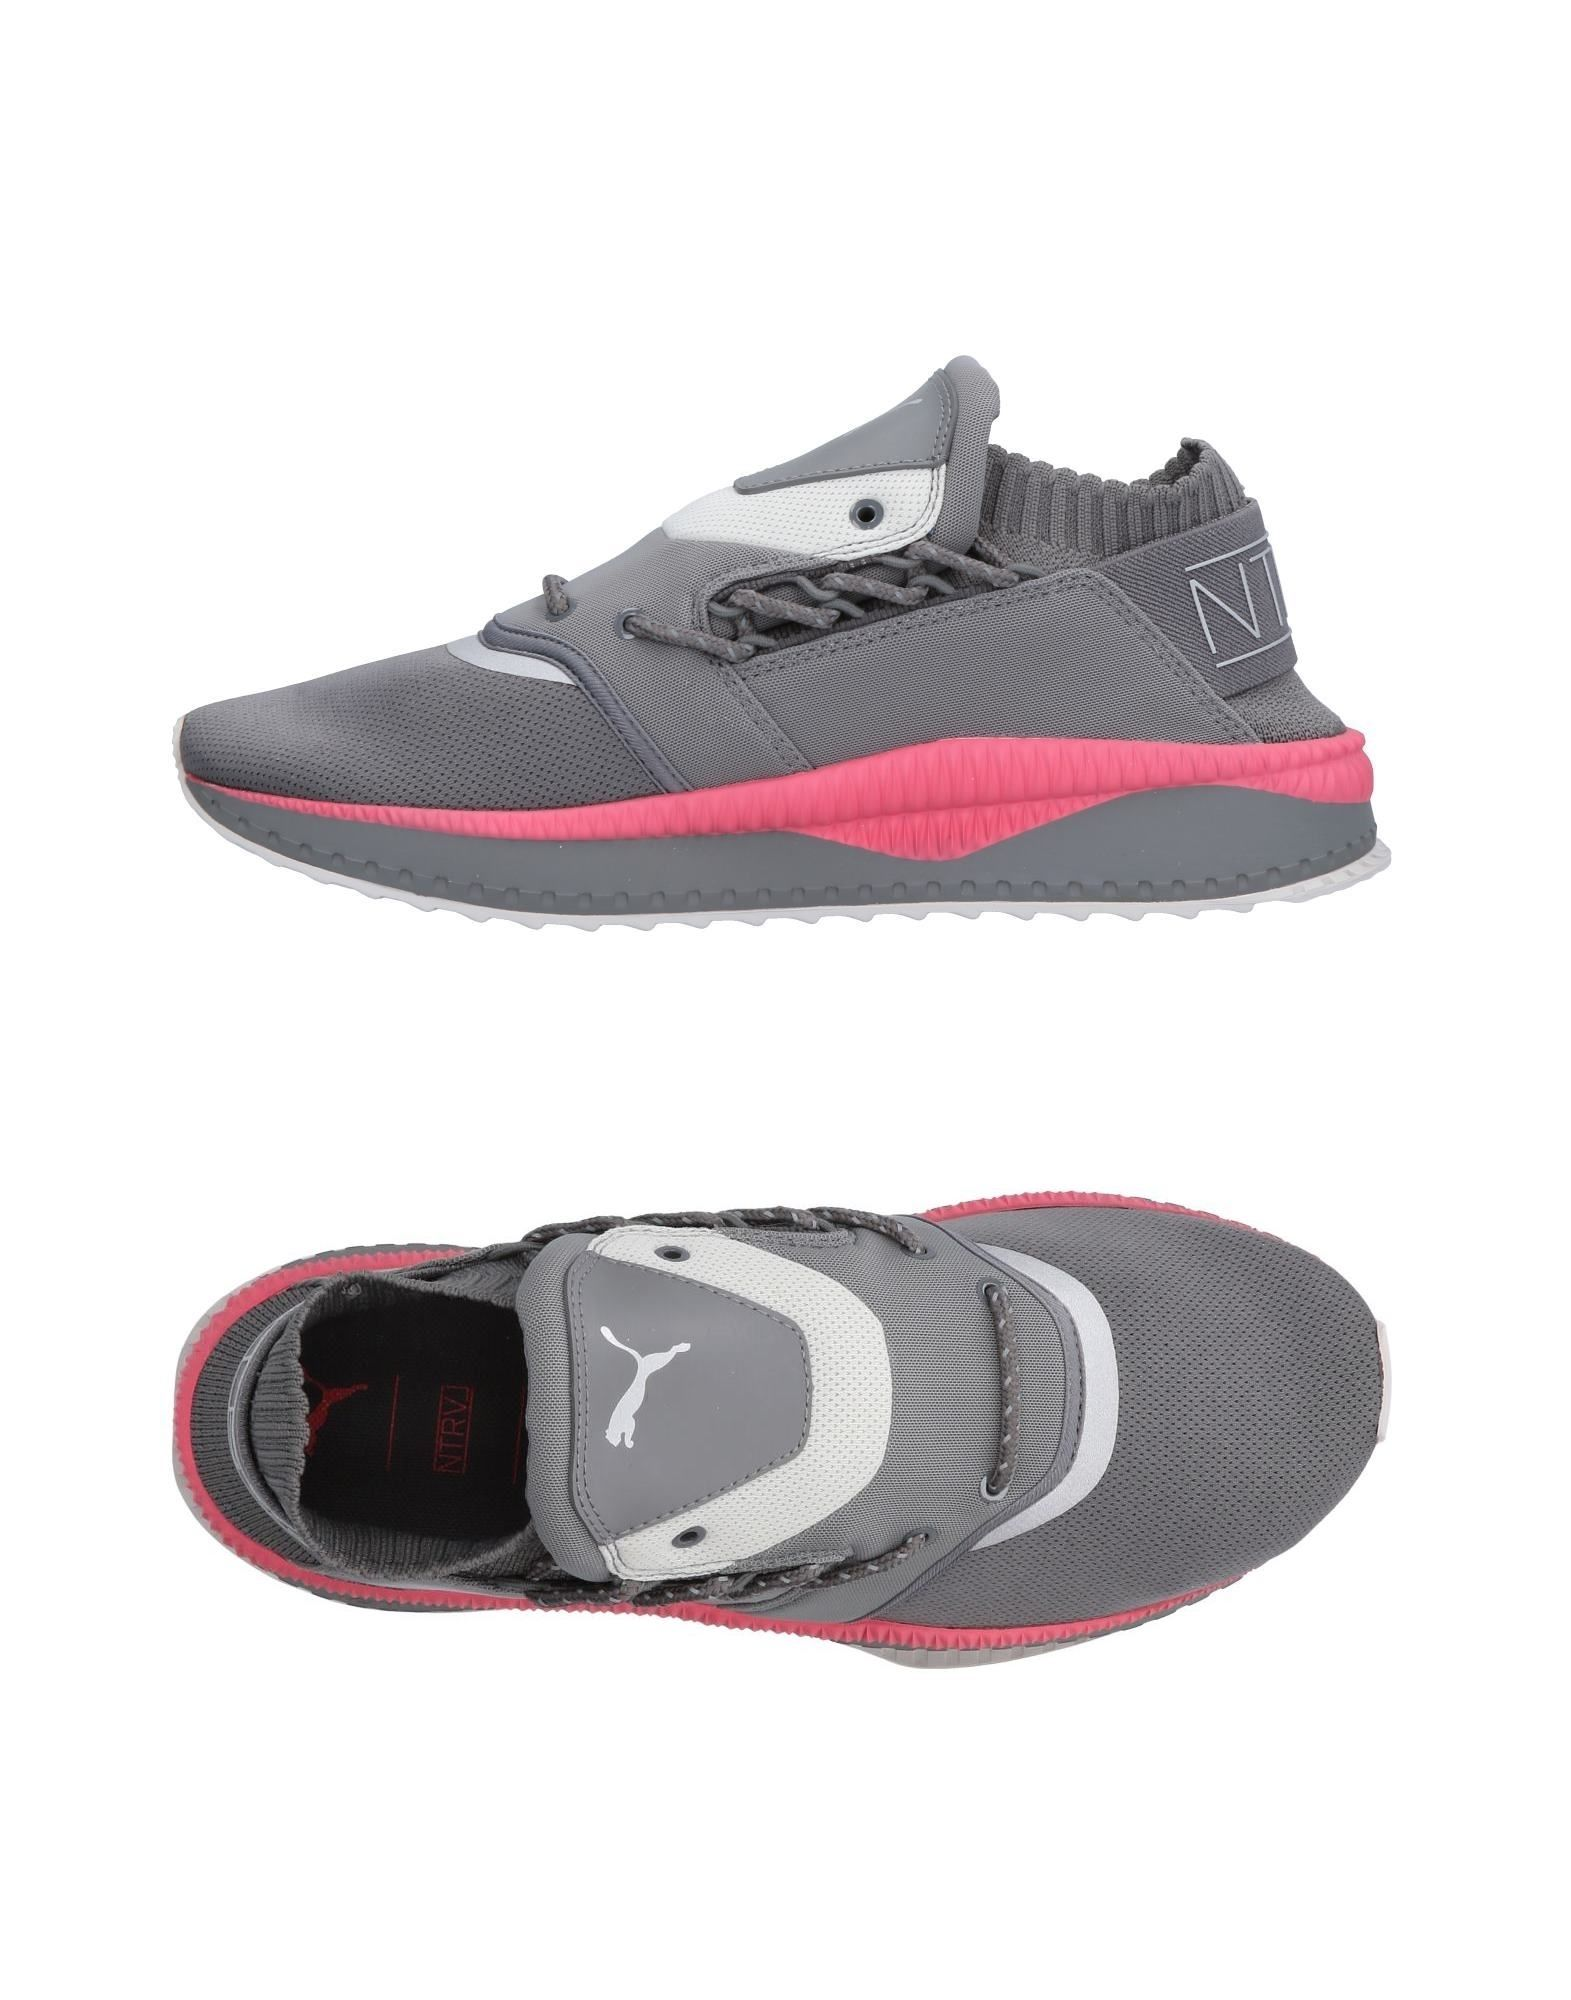 Moda Sneakers Sneakers Moda Puma Uomo - 11496970AX 419012